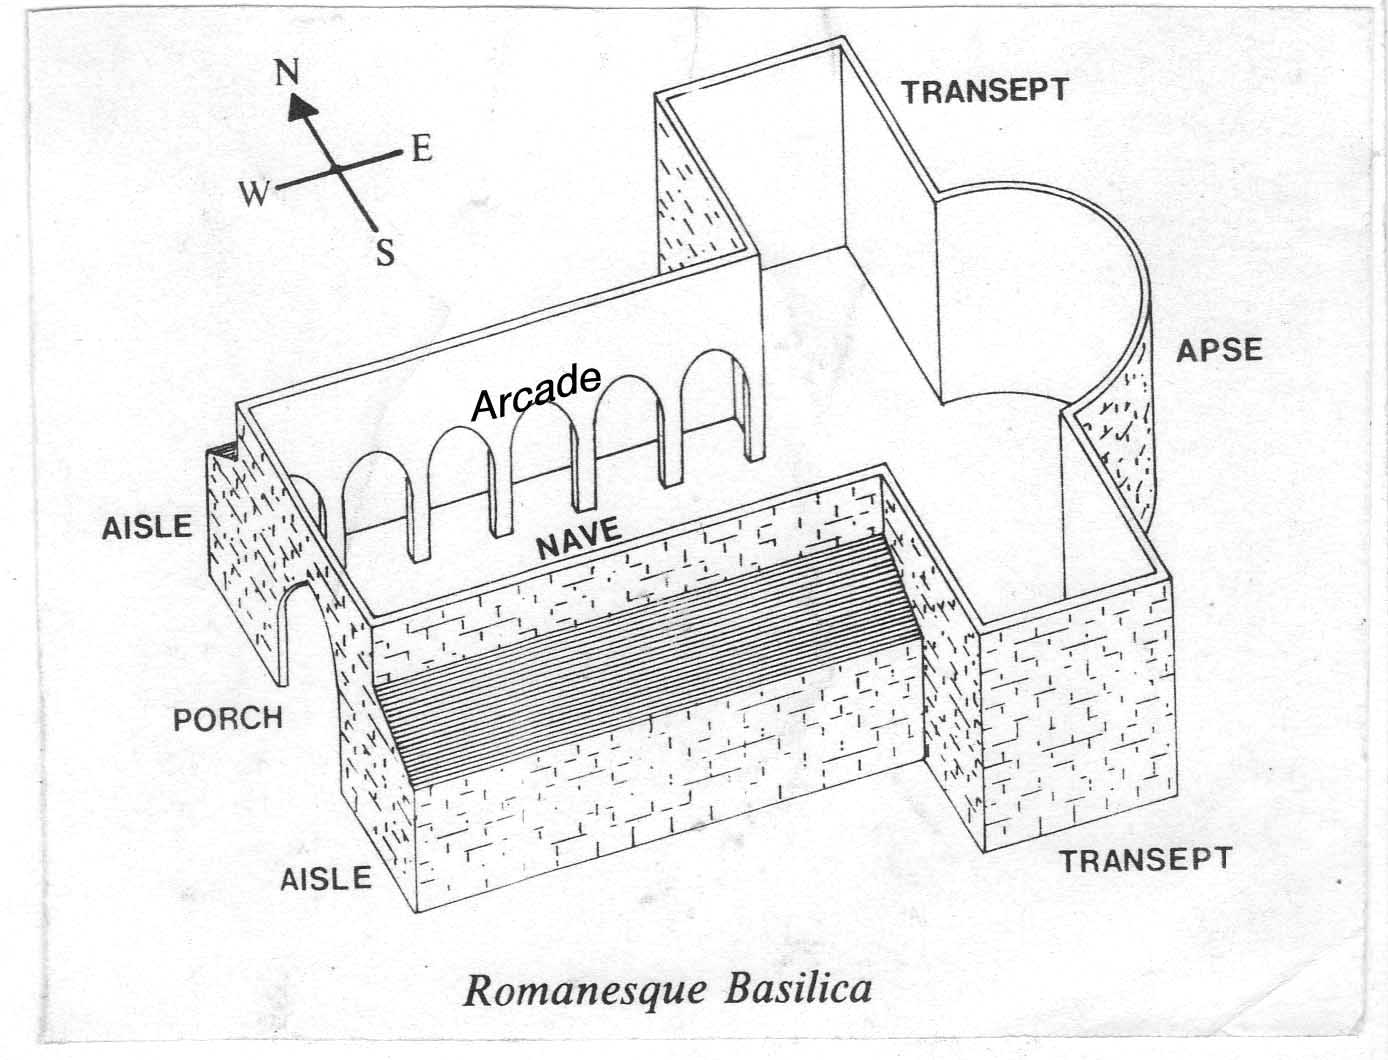 diagram of gothic church jl audio e1200 wiring romanesque art history leaving cert